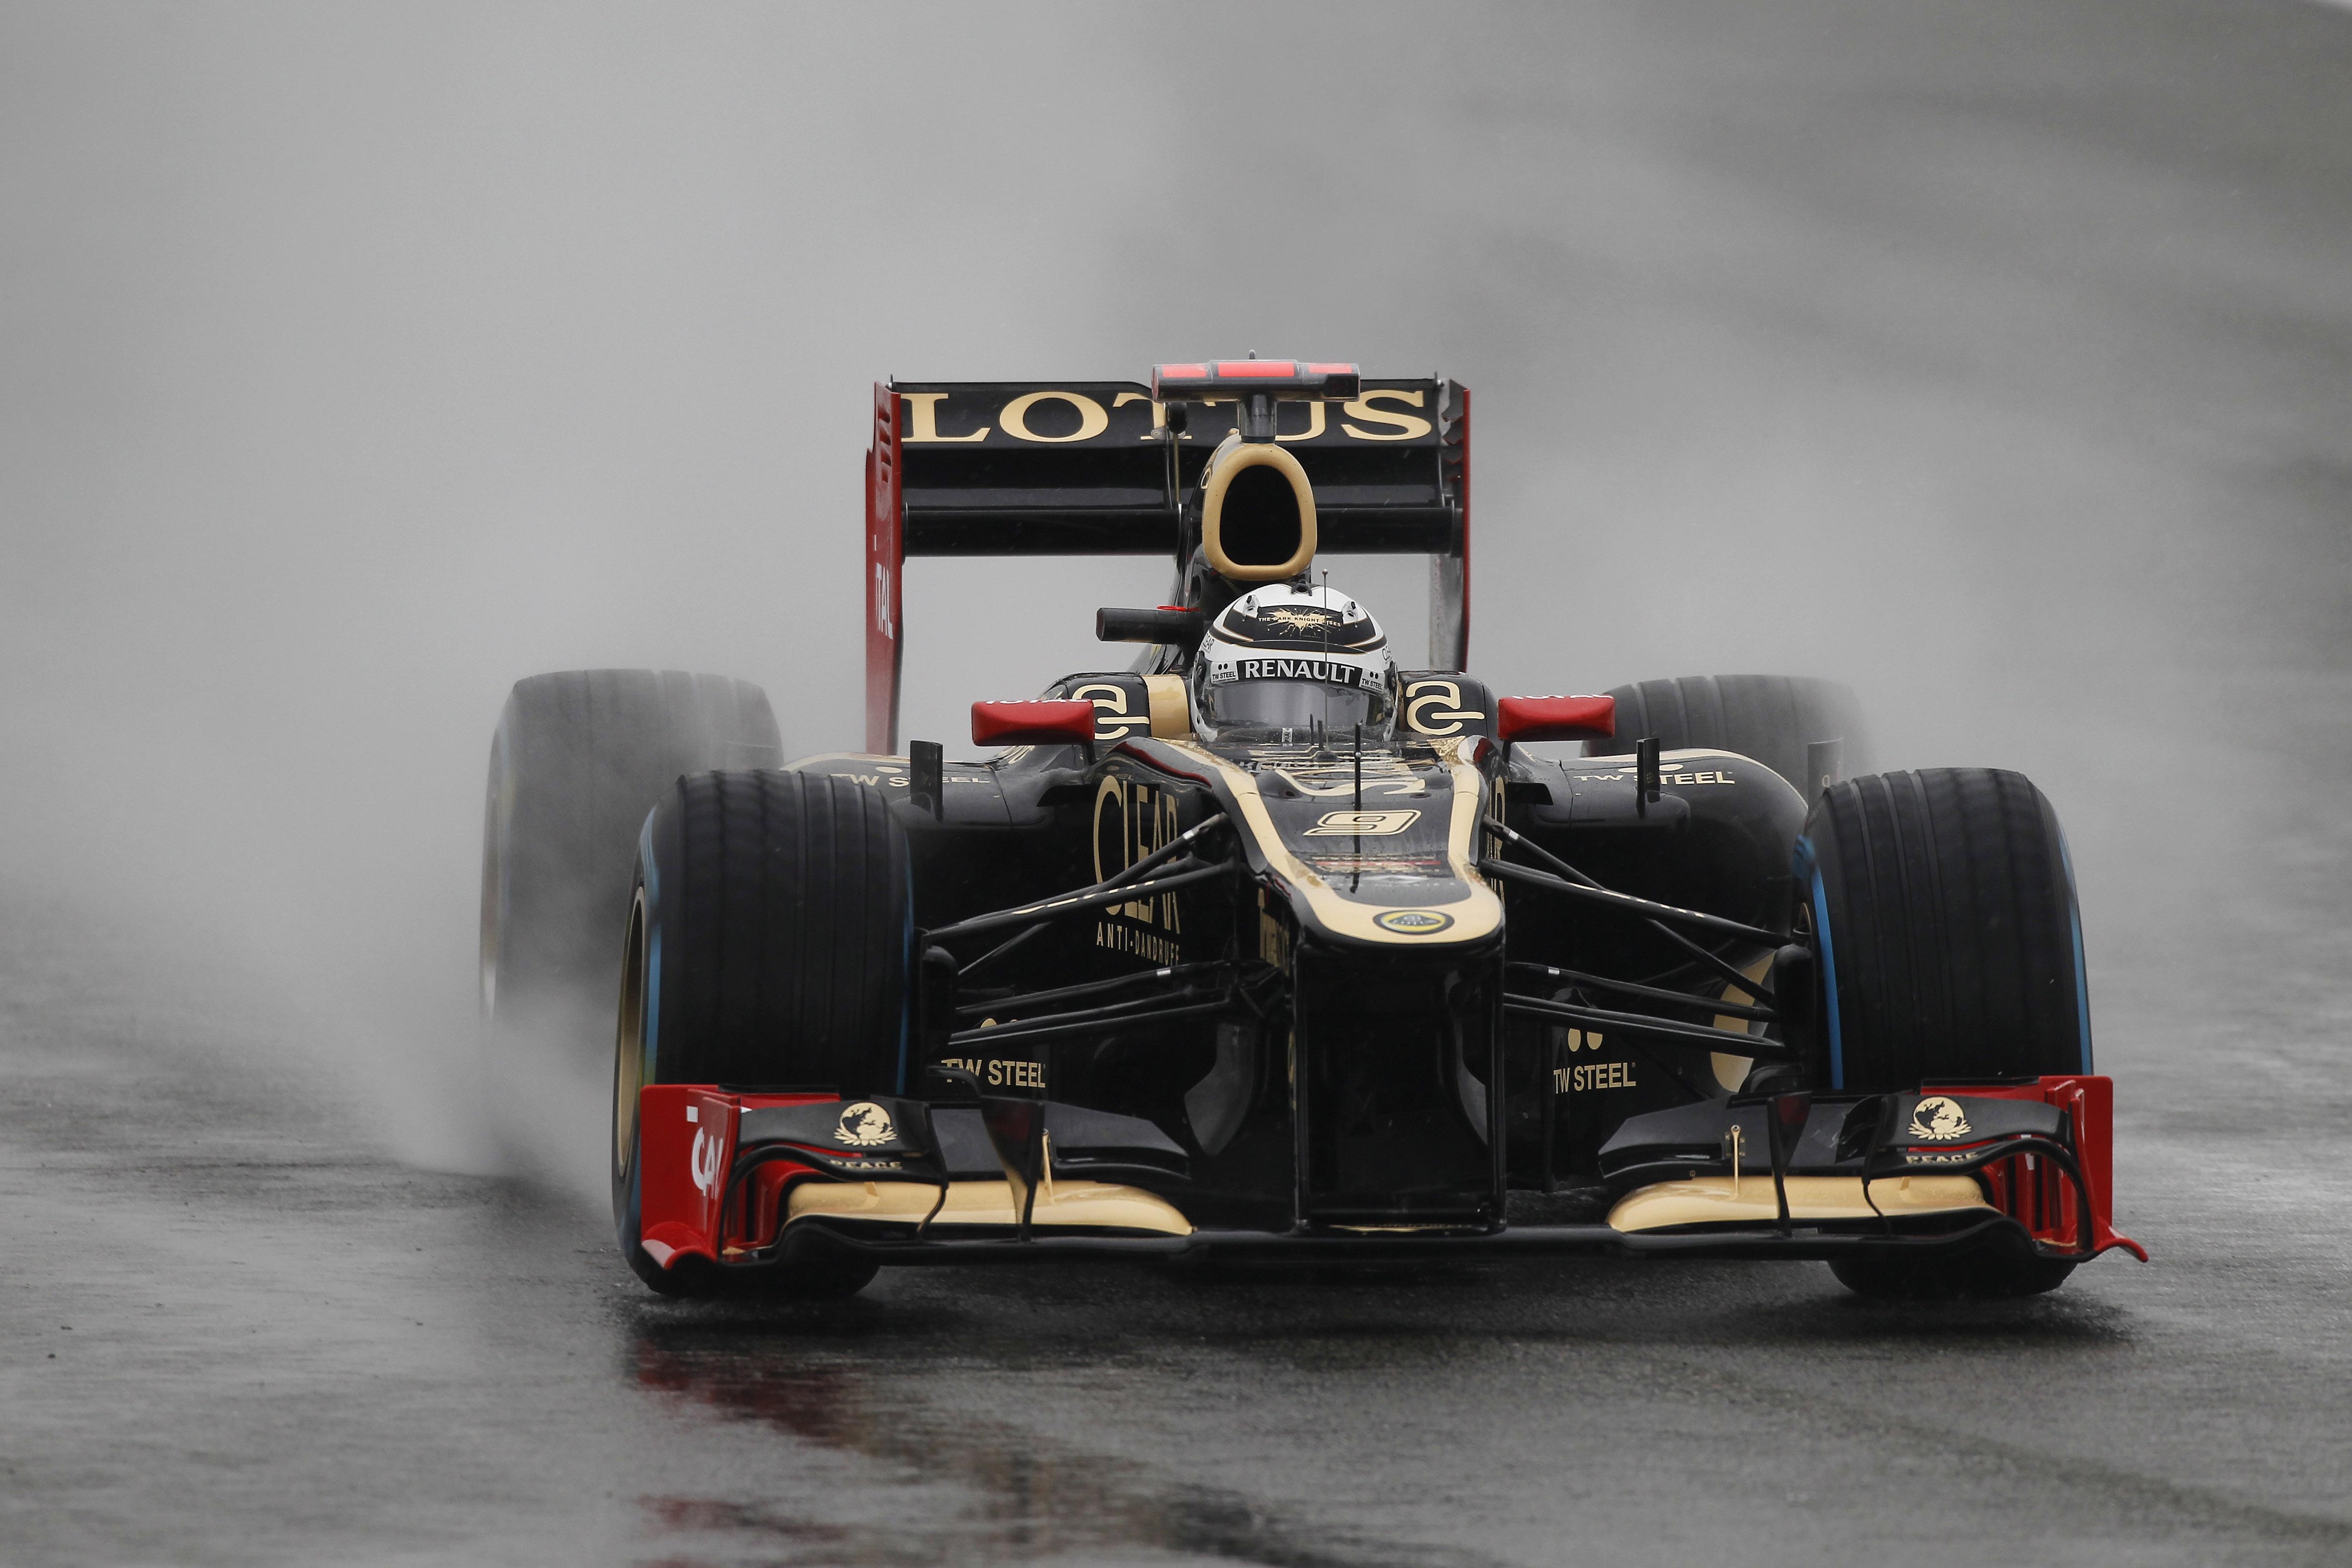 f1 2012 british grand prix qualifying lotus f1 team motor sport press. Black Bedroom Furniture Sets. Home Design Ideas